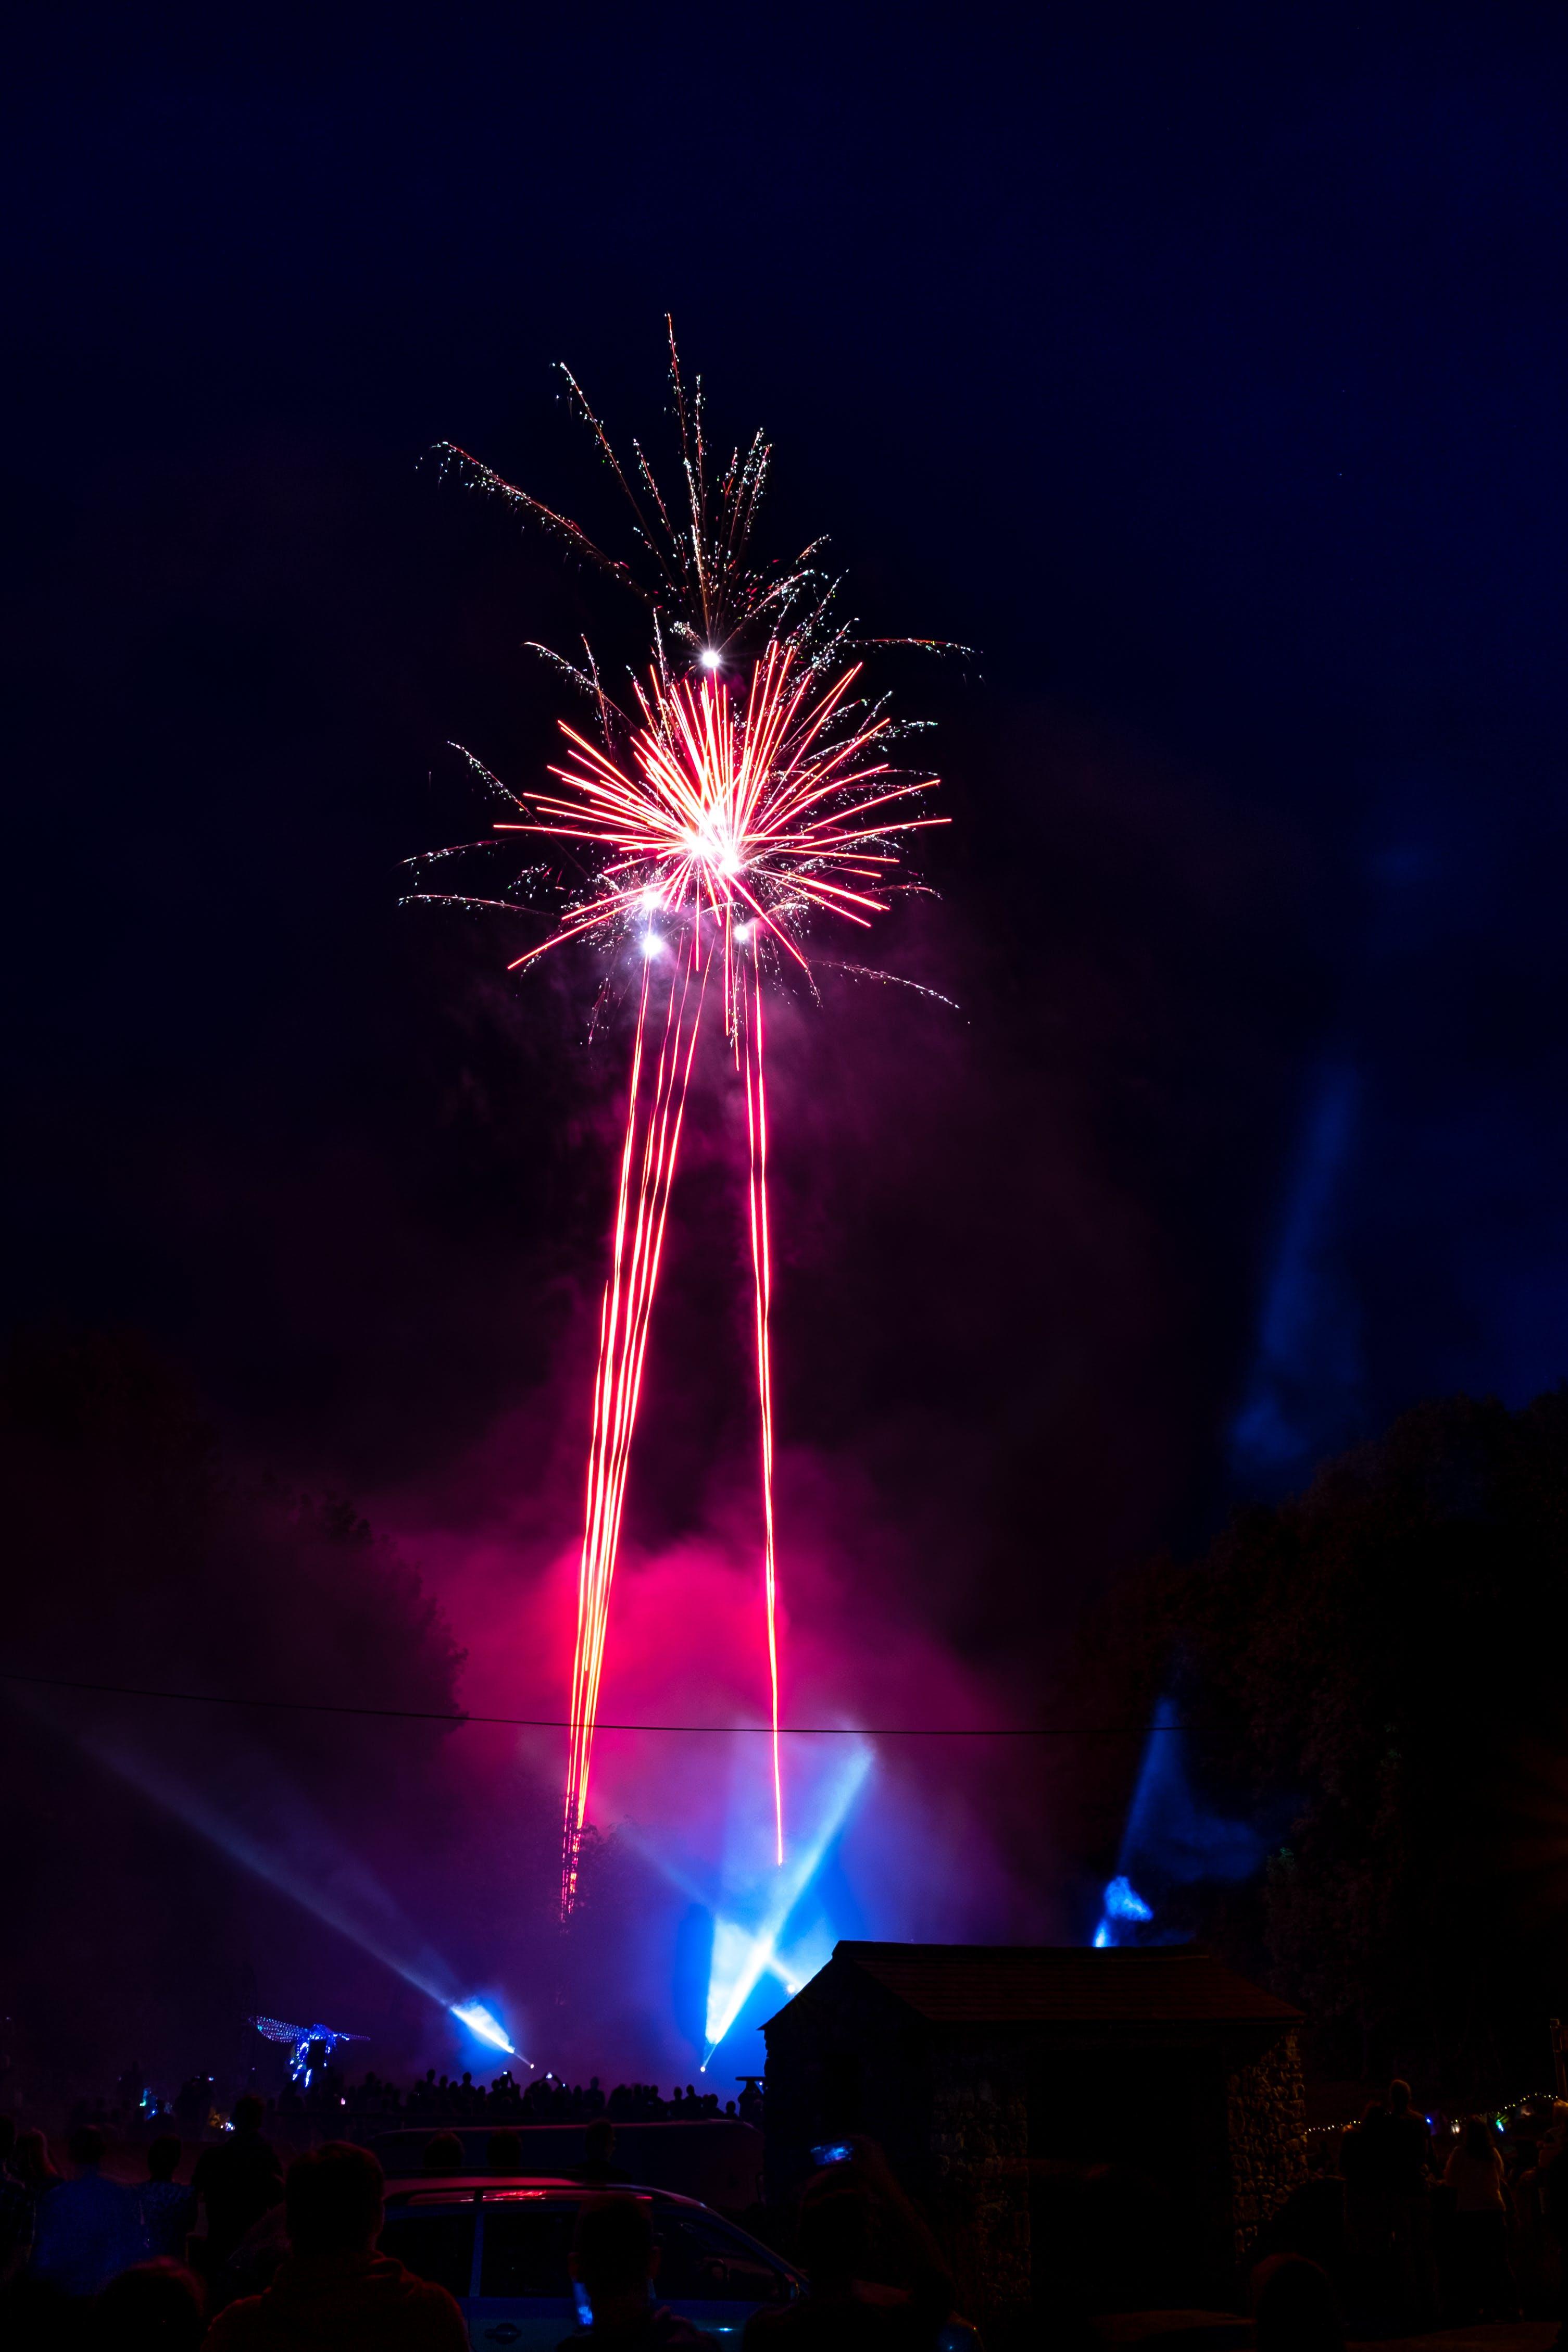 Kostenloses Stock Foto zu himmel, nacht, party, explosion